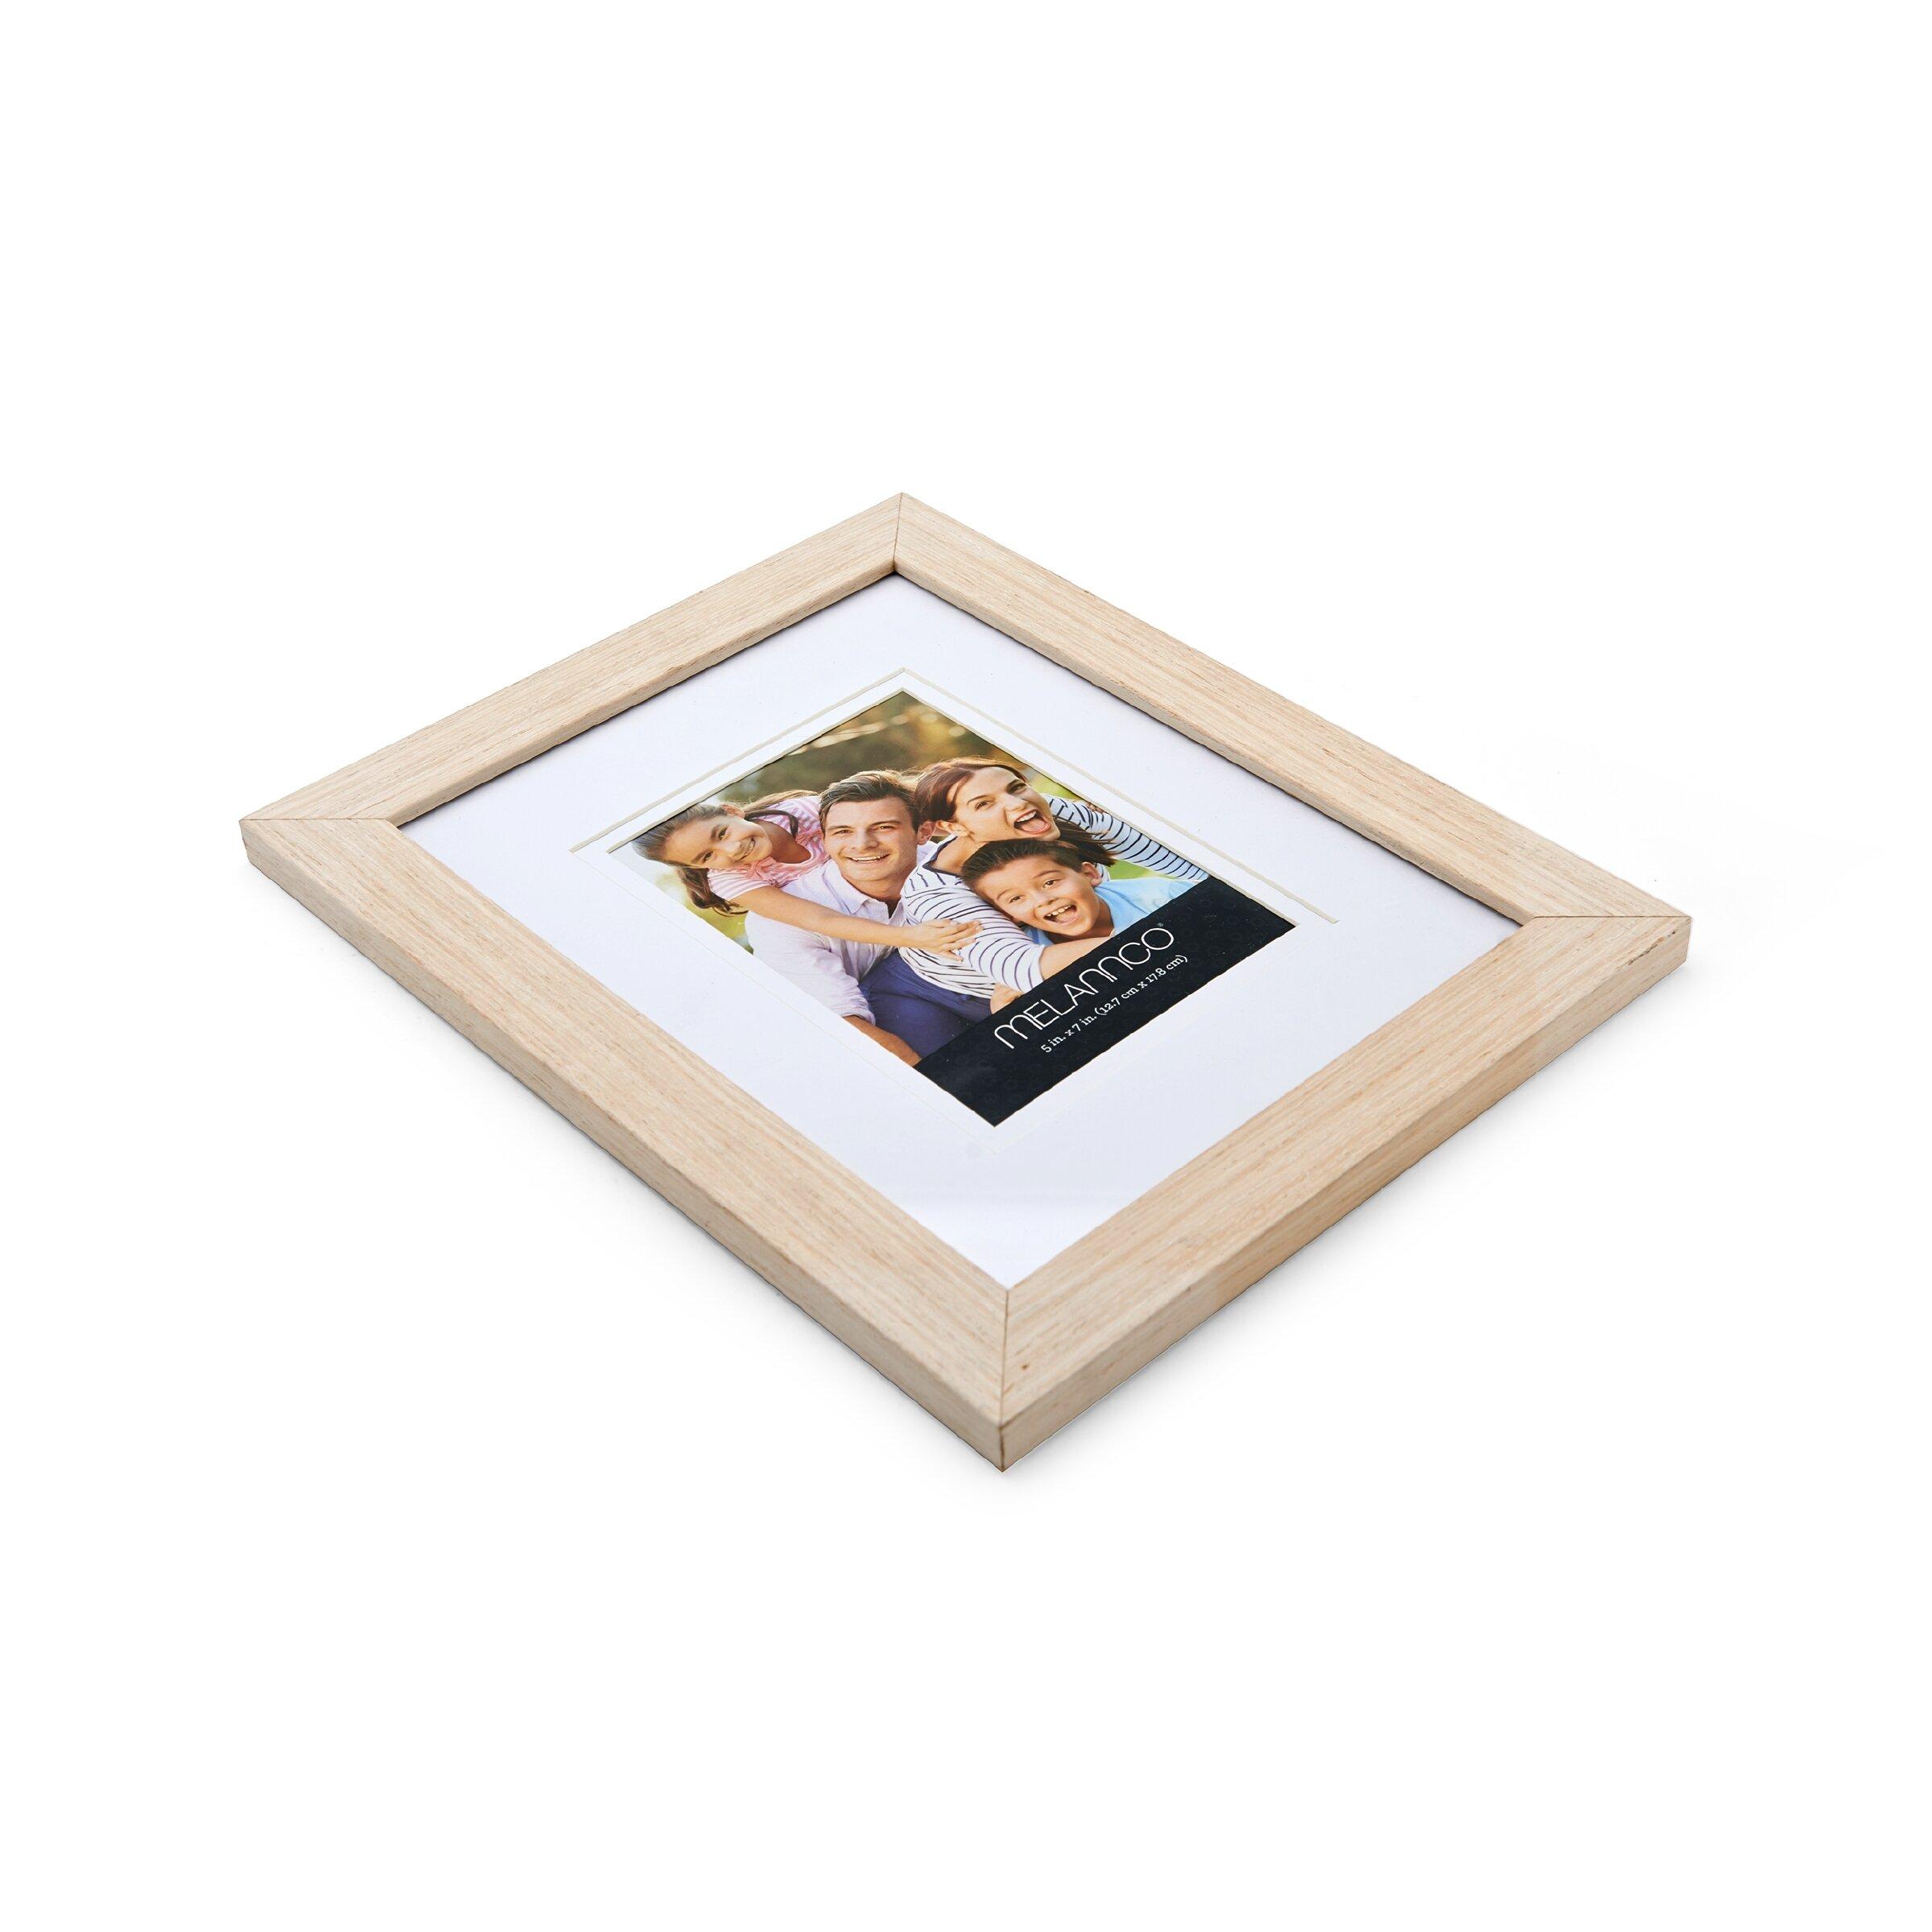 Melannco Picture Frame | Wayfair